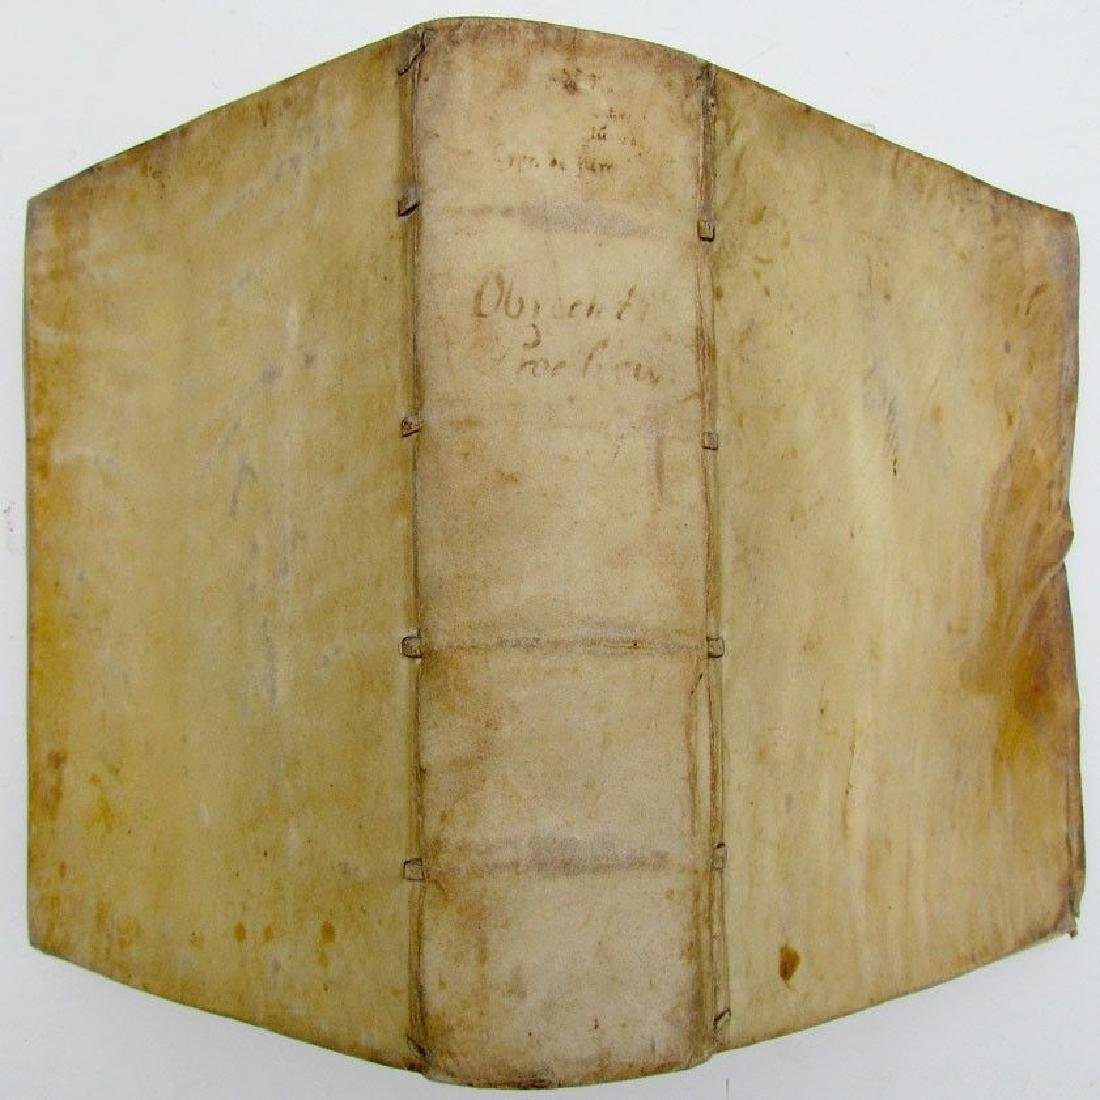 1604 Vellum Bound Antique Book Georgii Obrechti Jc.